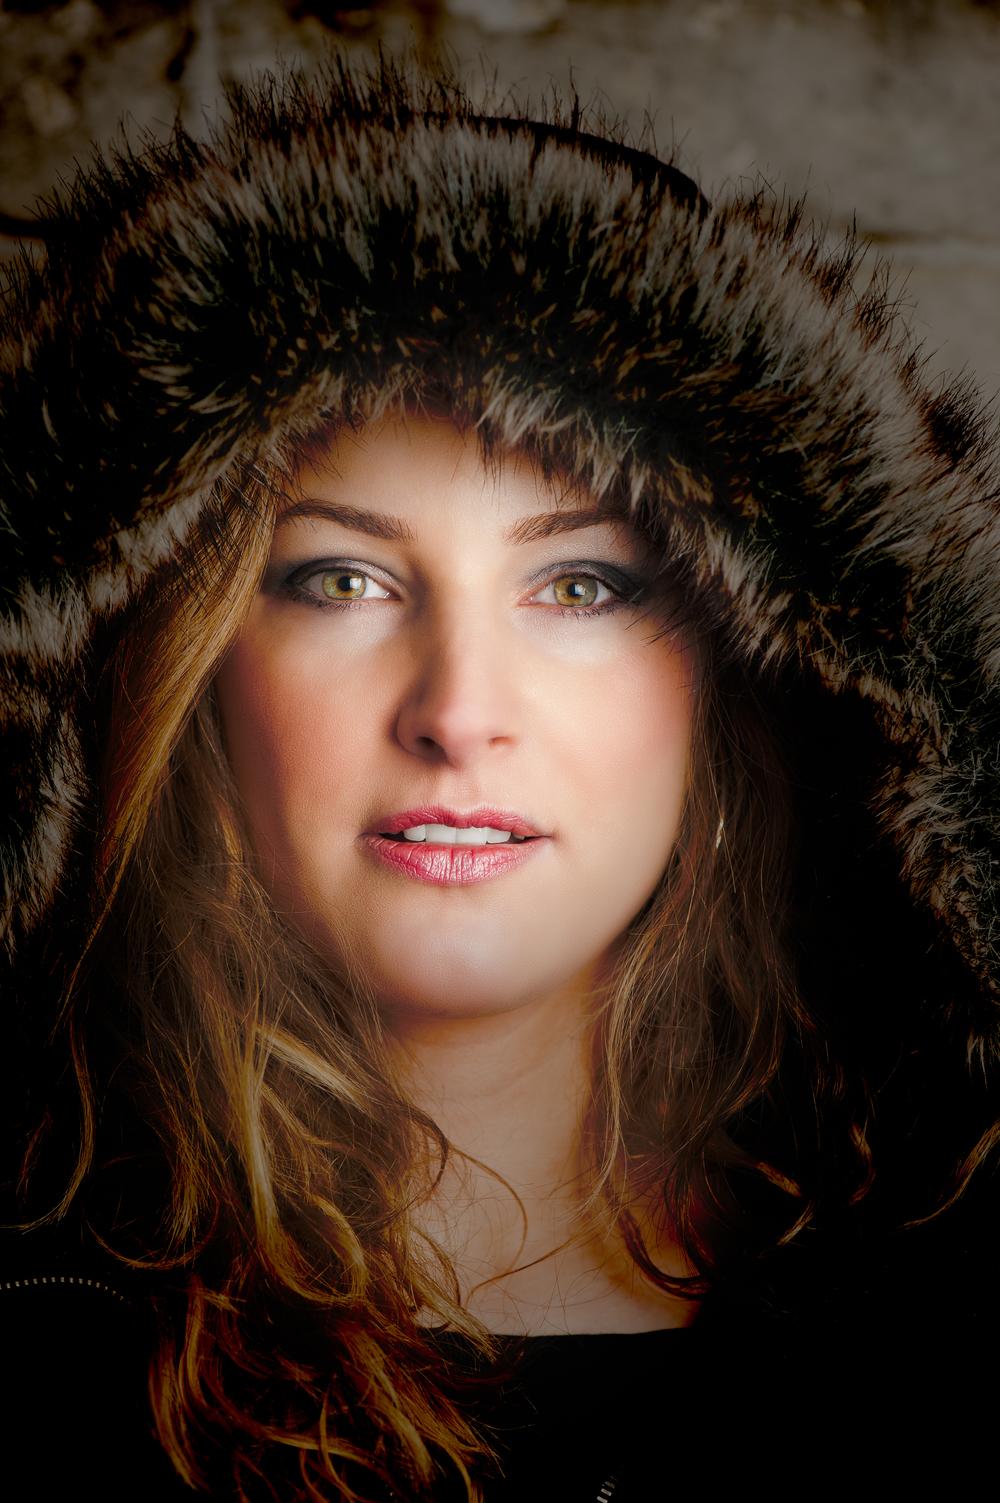 Portret_Mirjam_Locatie_Luik_20120122_0006-Edit-2.jpg